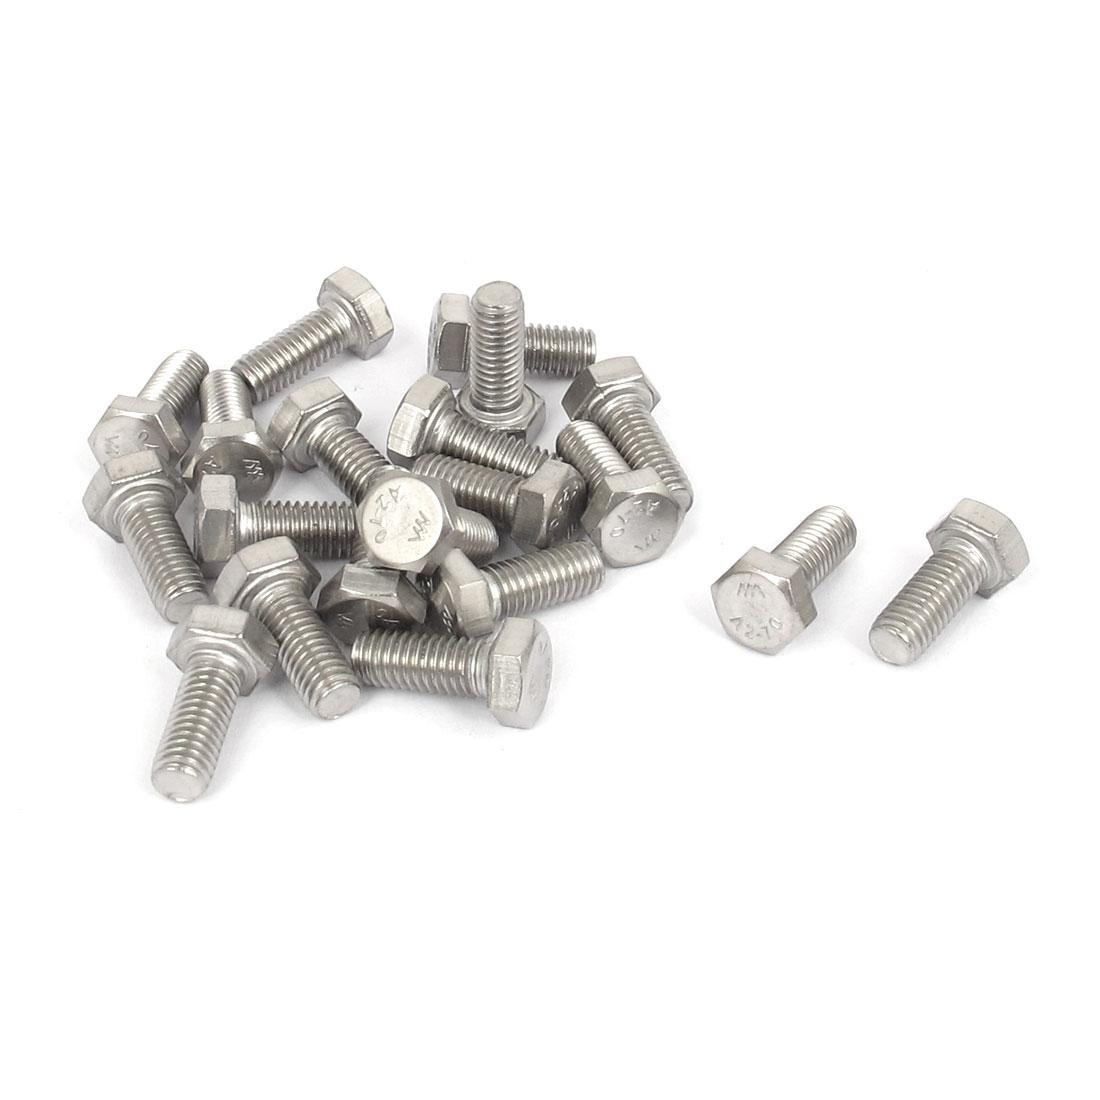 M5x12mm Thread 304 Stainless Steel Hex Hexagon Head Screw Bolt 20pcs